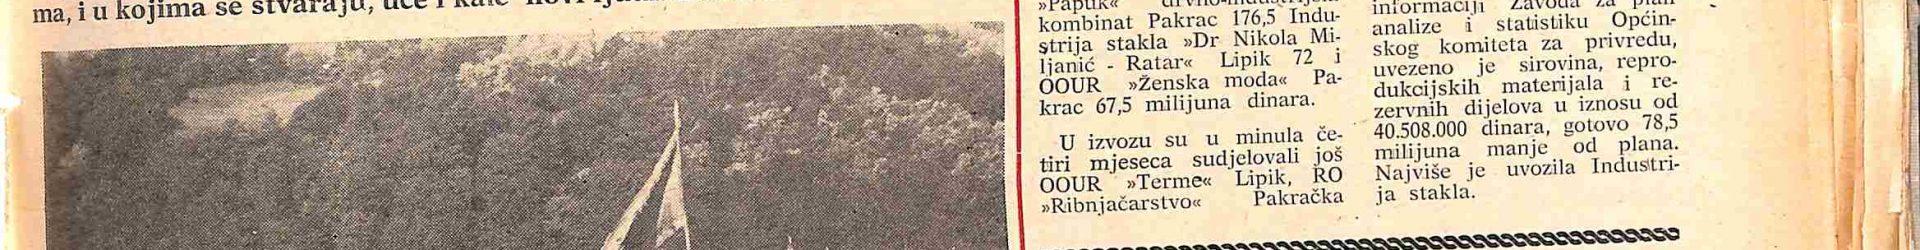 27 lipnja 1984_Page_1